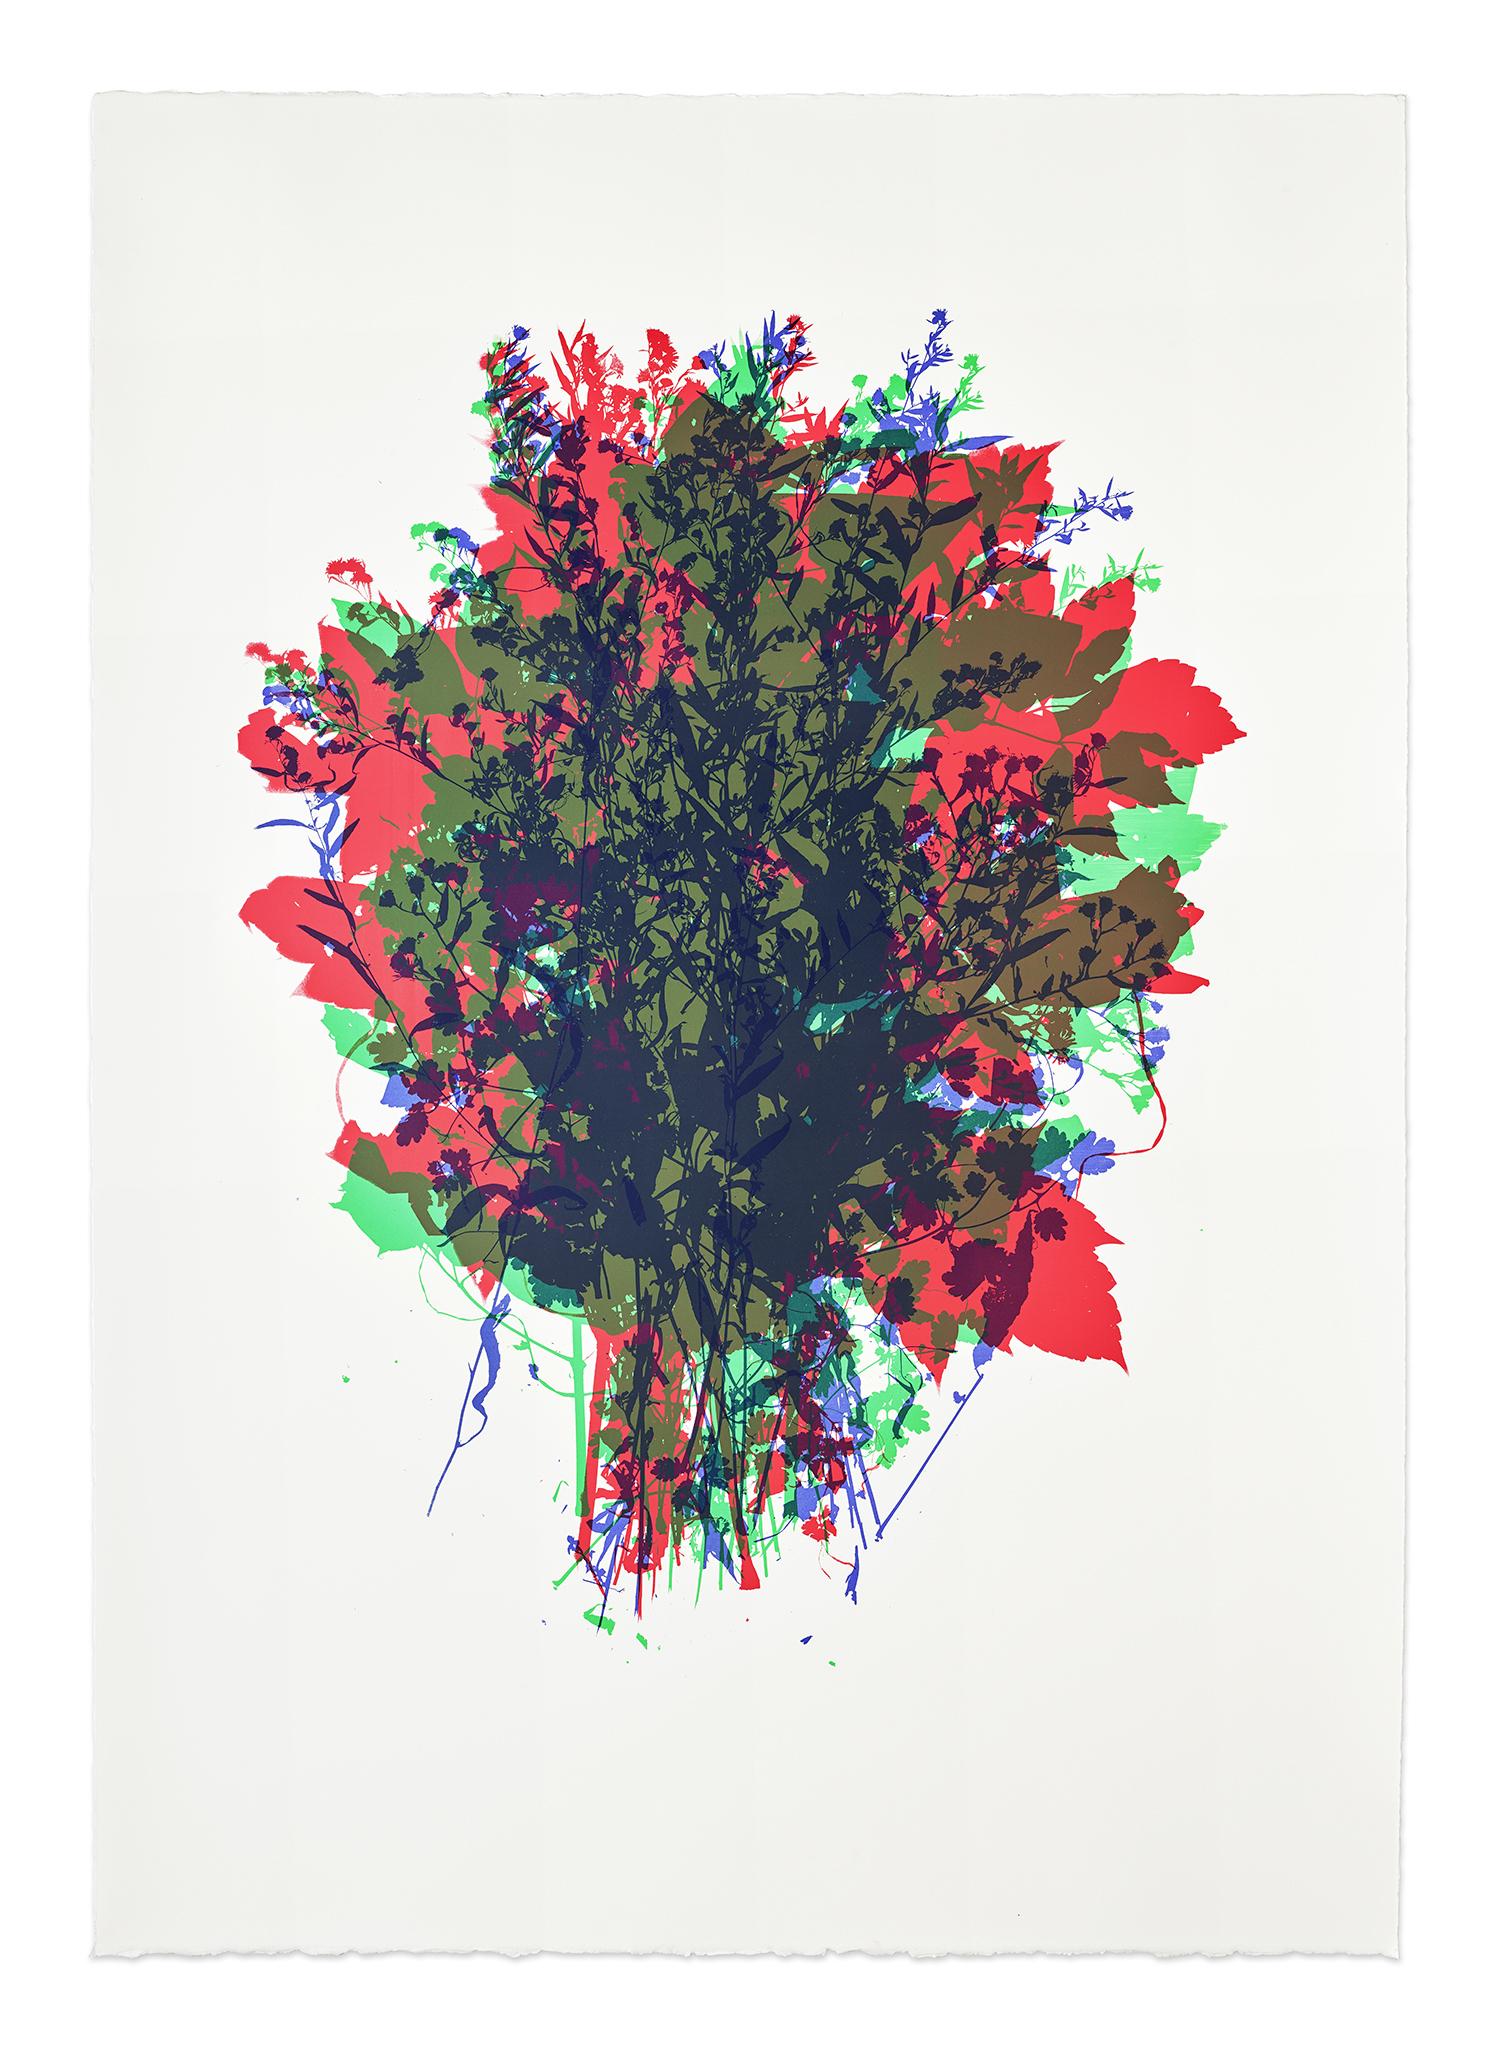 Flowers Grow, Weeds Grow ( 2 of 2 ) - 2018